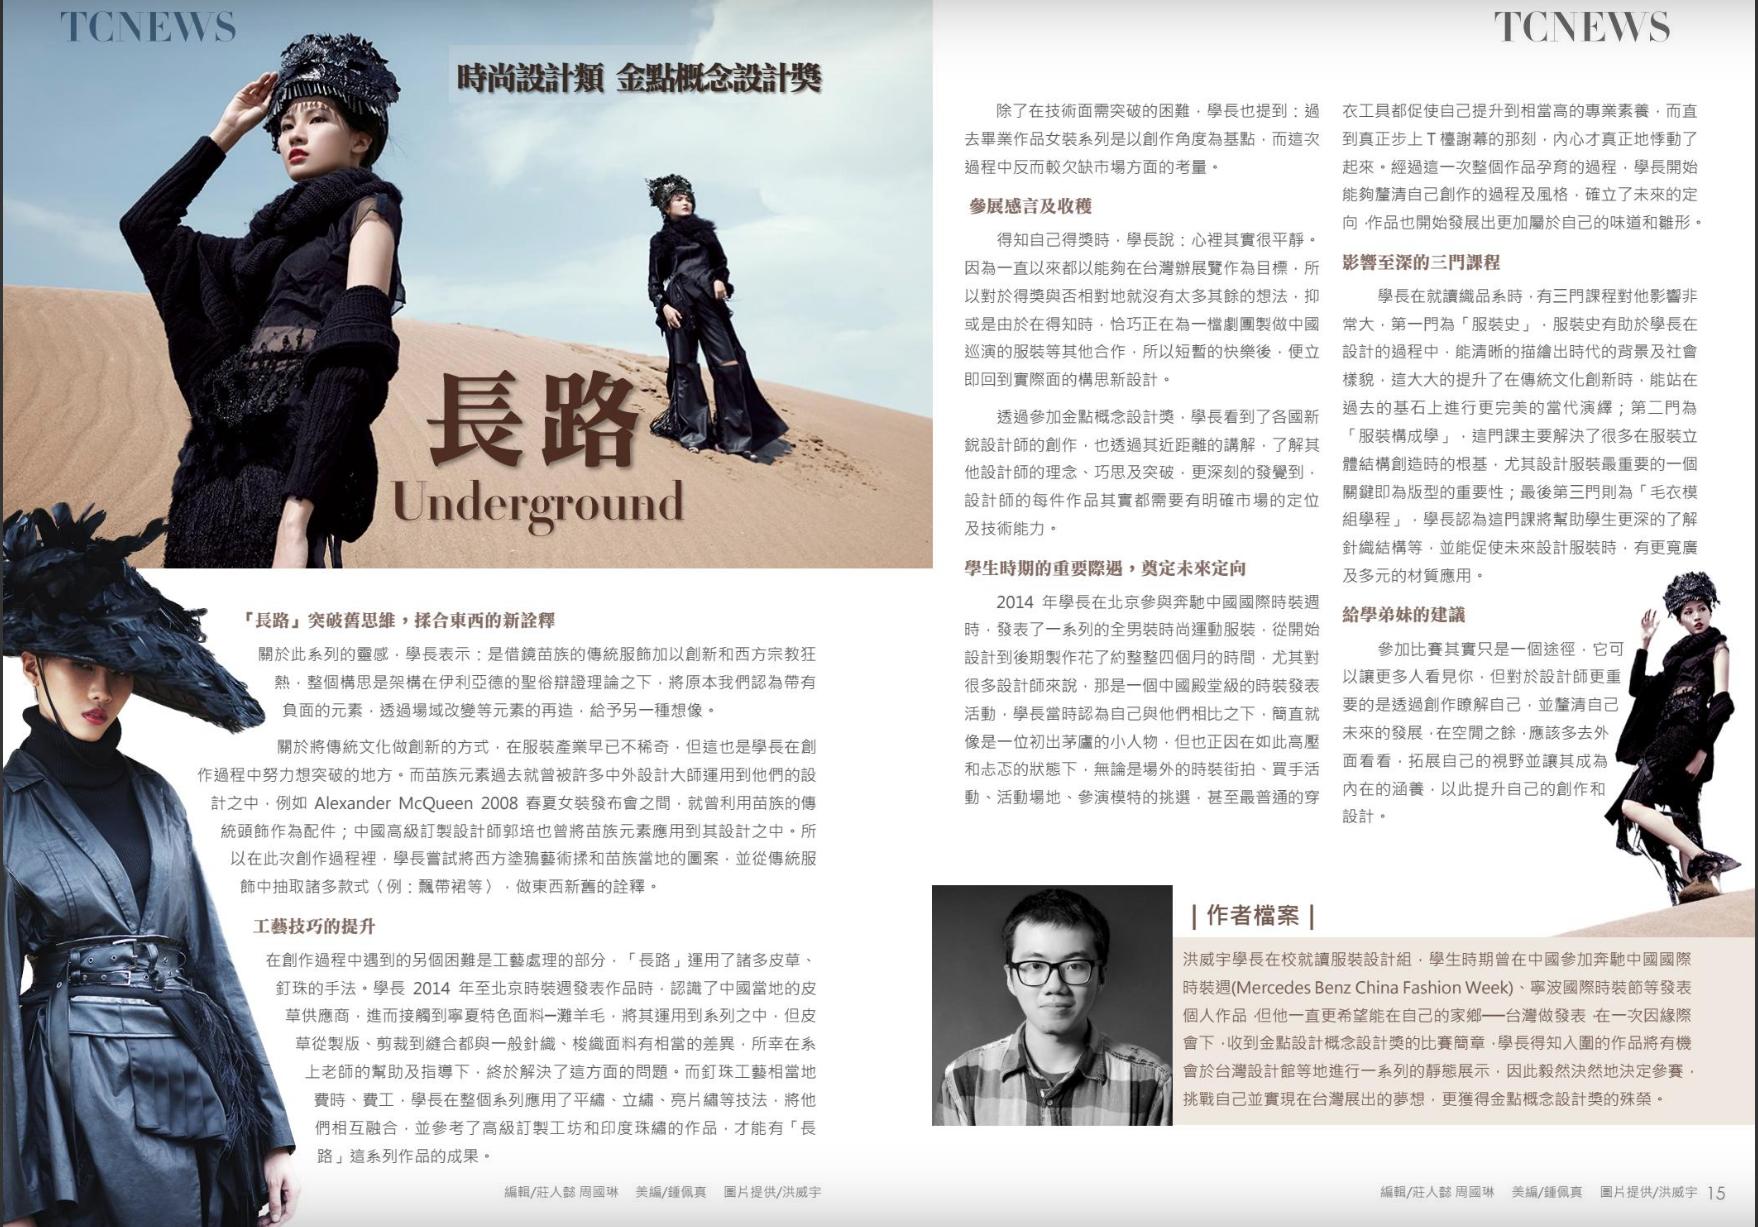 "23, September, 2016 ""Taiwanese fashion designer HUNG WEIYU got the Golden Pin Concept Design Awards"" from TCNEWS (Mandarin version)"